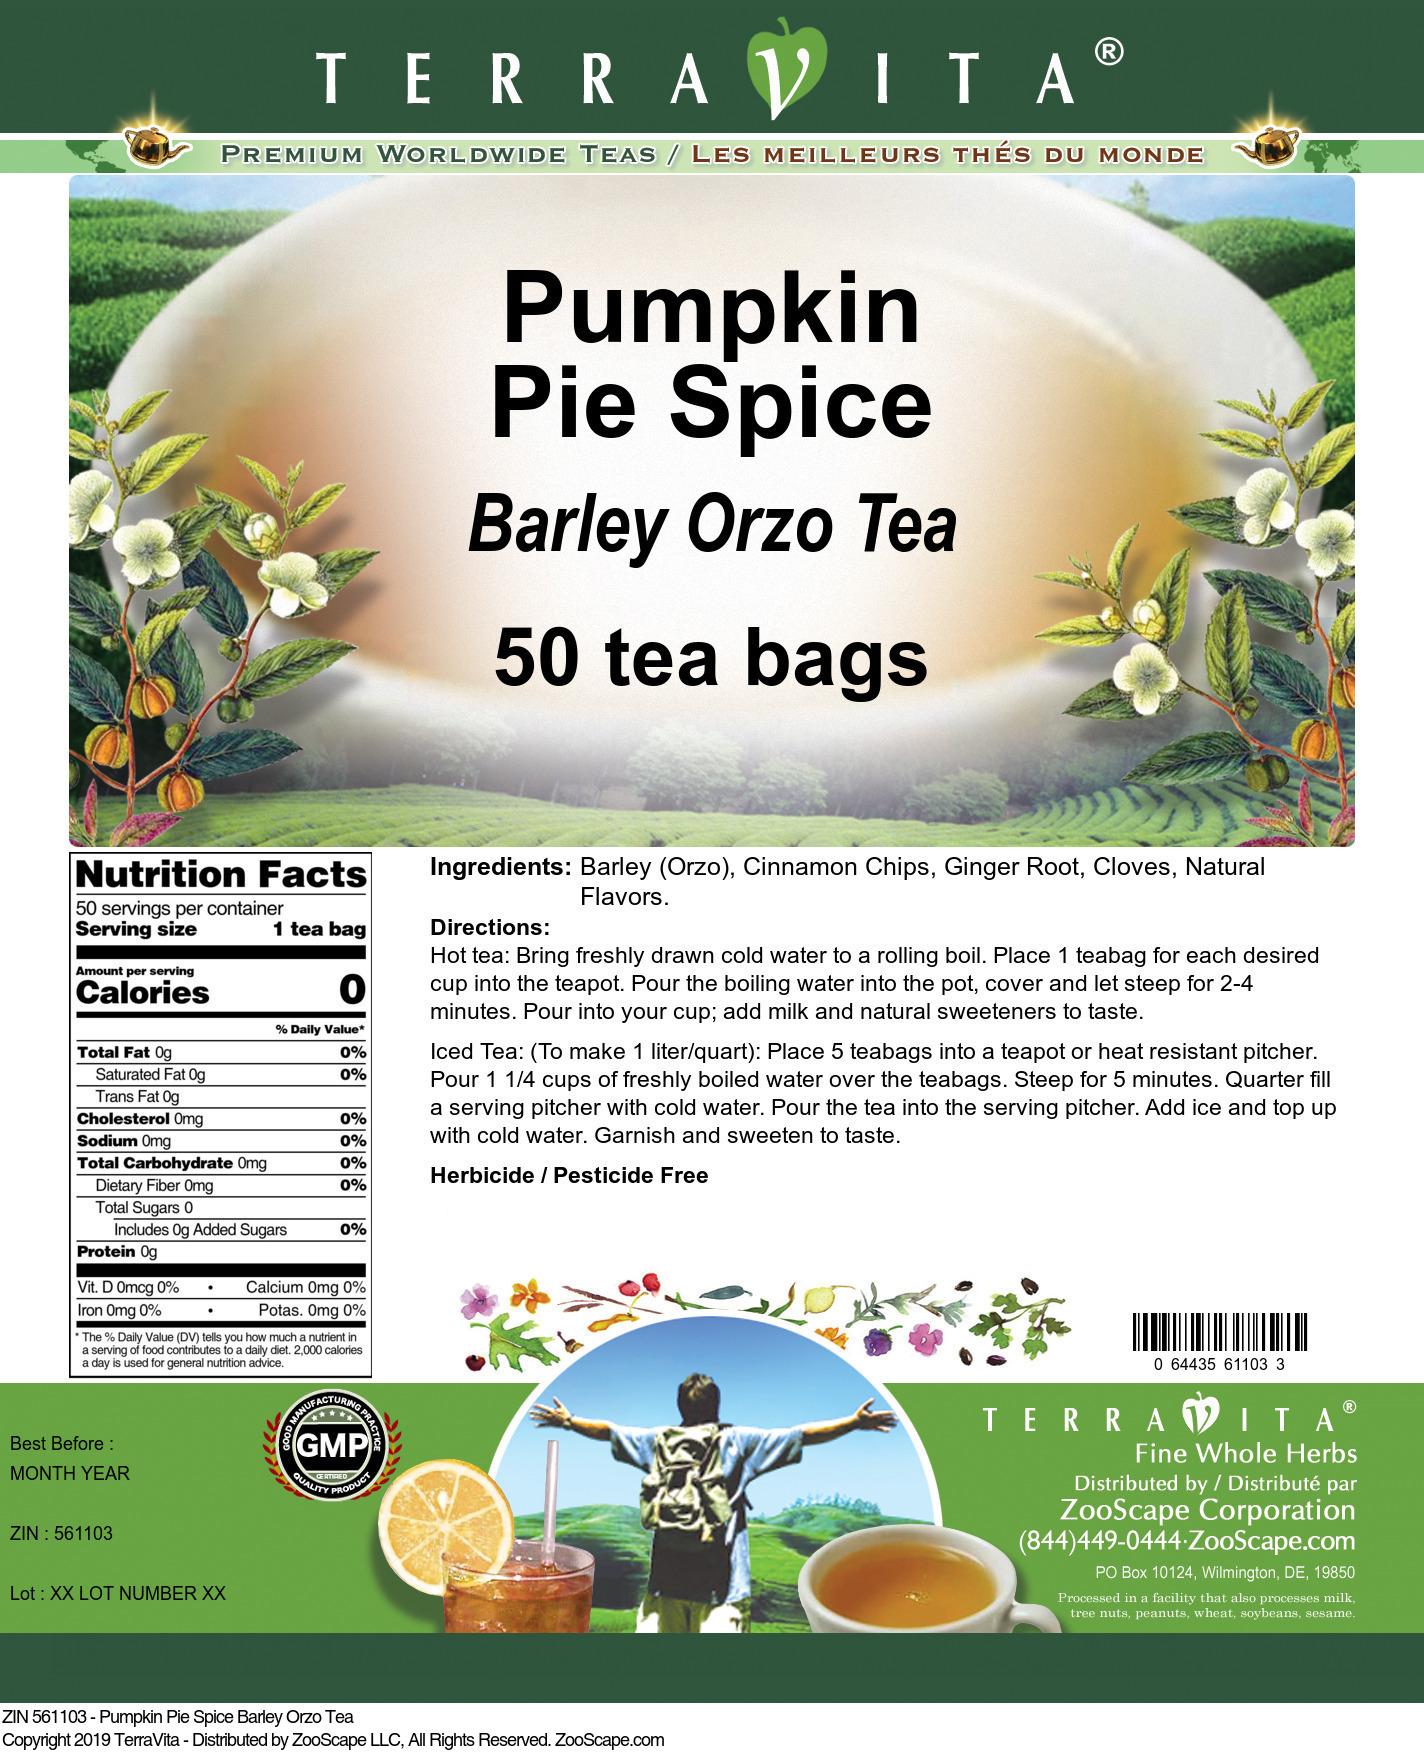 Pumpkin Pie Spice Barley Orzo